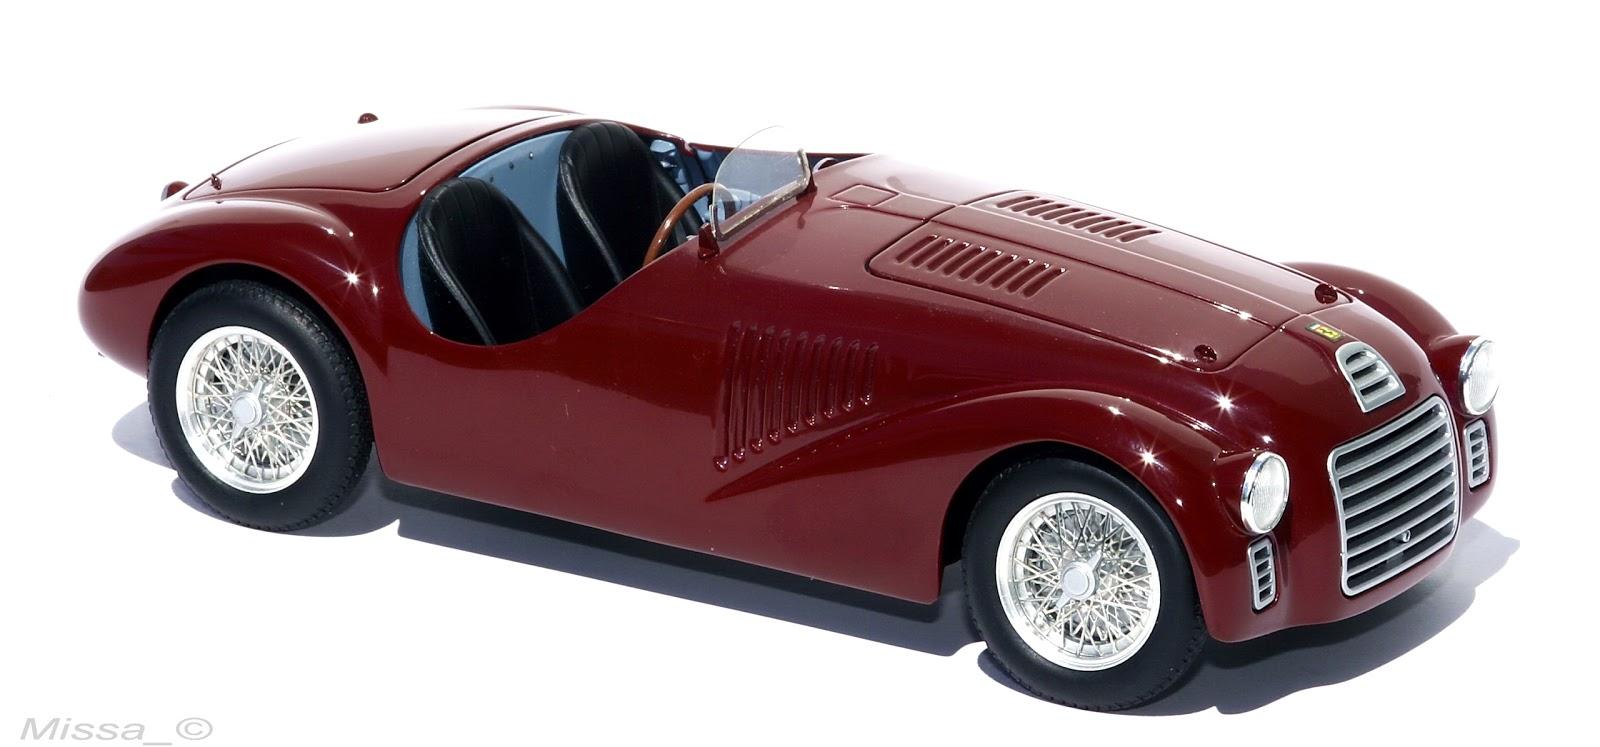 missa akv riuma s egy b marhas gai hot wheels elite ferrari 125 s 1947. Black Bedroom Furniture Sets. Home Design Ideas